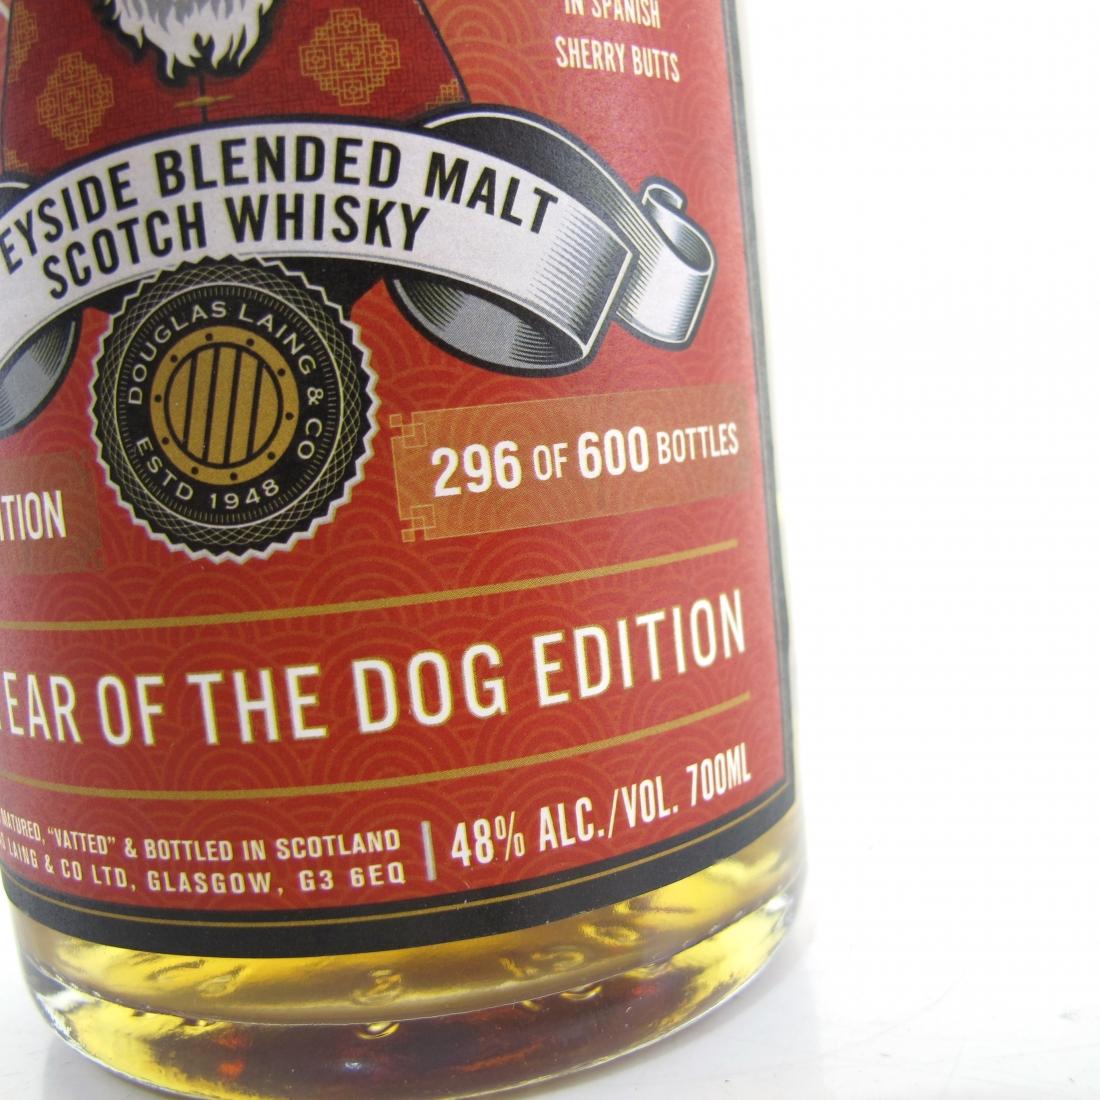 Scallywag Speyside Blended Malt / Year Of The Dog Edition